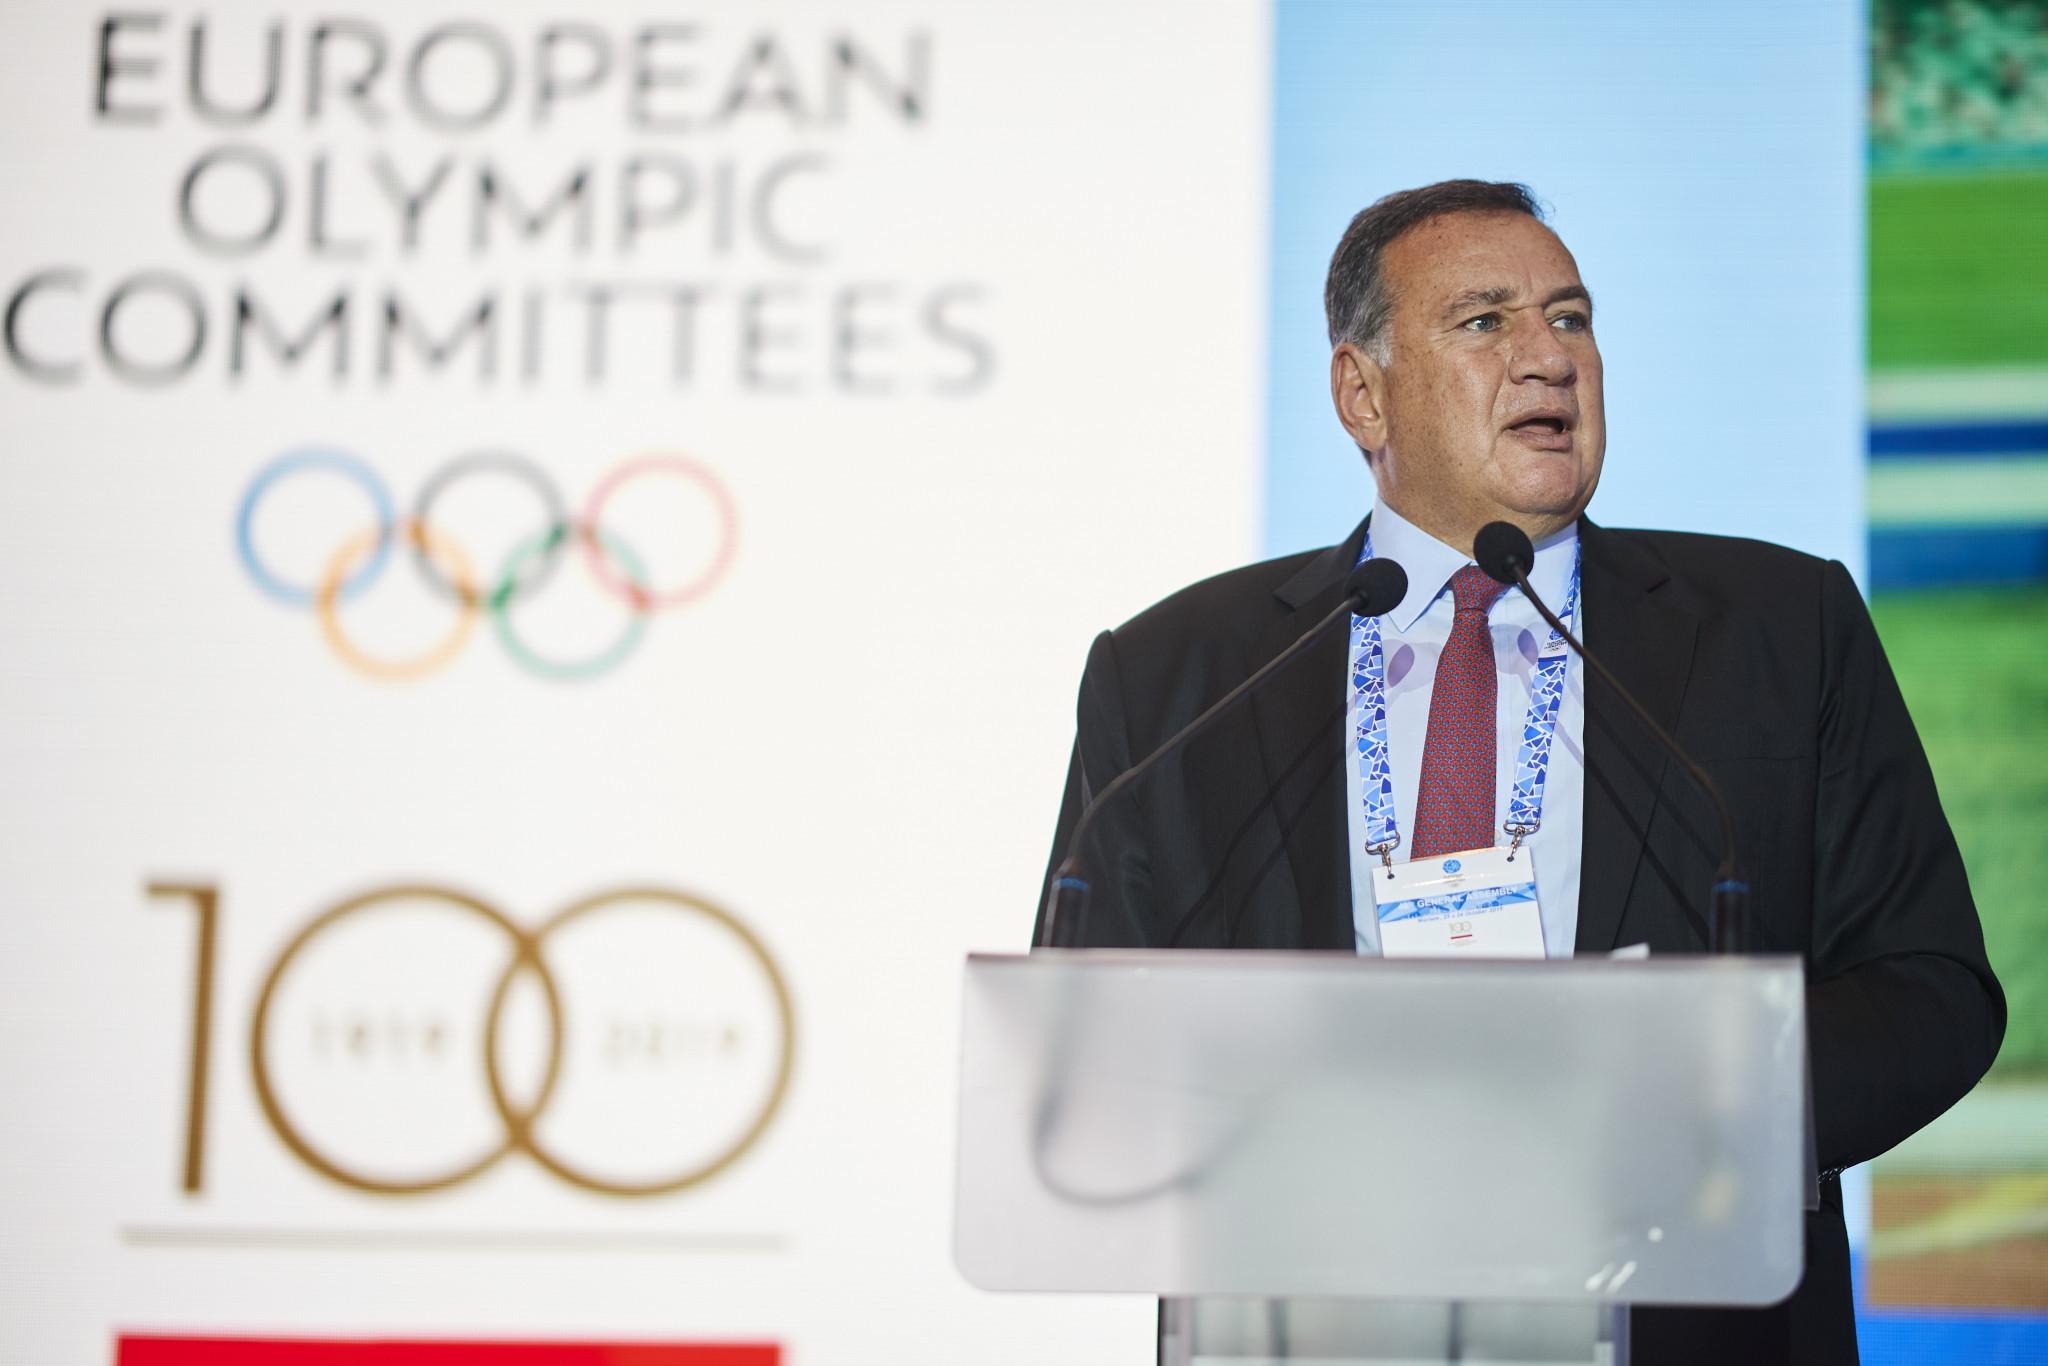 Capralos urges EOC to make European Games more sustainable